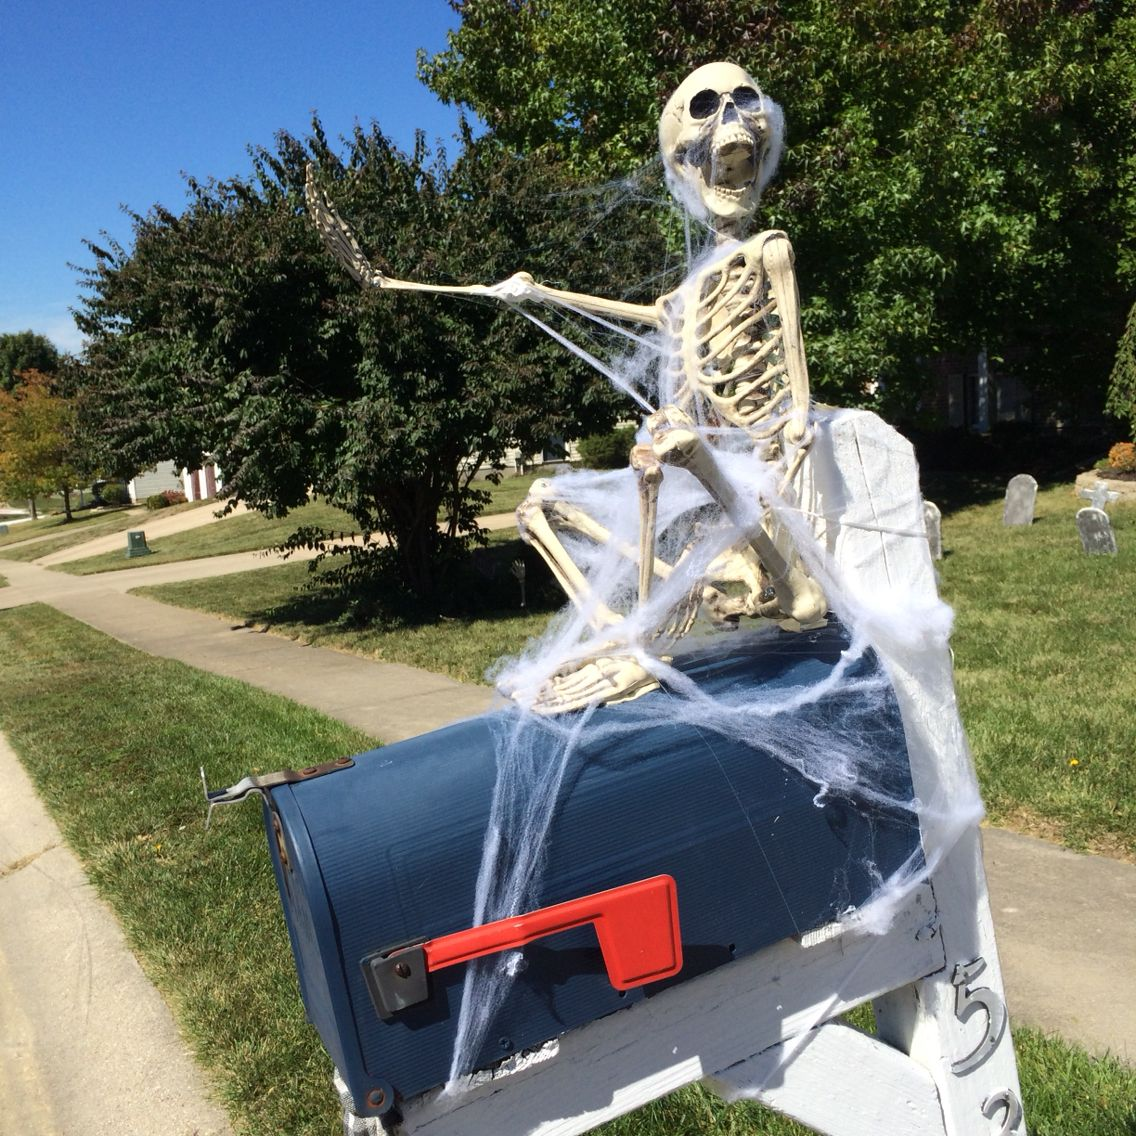 Skeleton mailbox halloween decoration  Hallelujah  ~ 222911_Halloween Decorating Ideas For Mailboxes